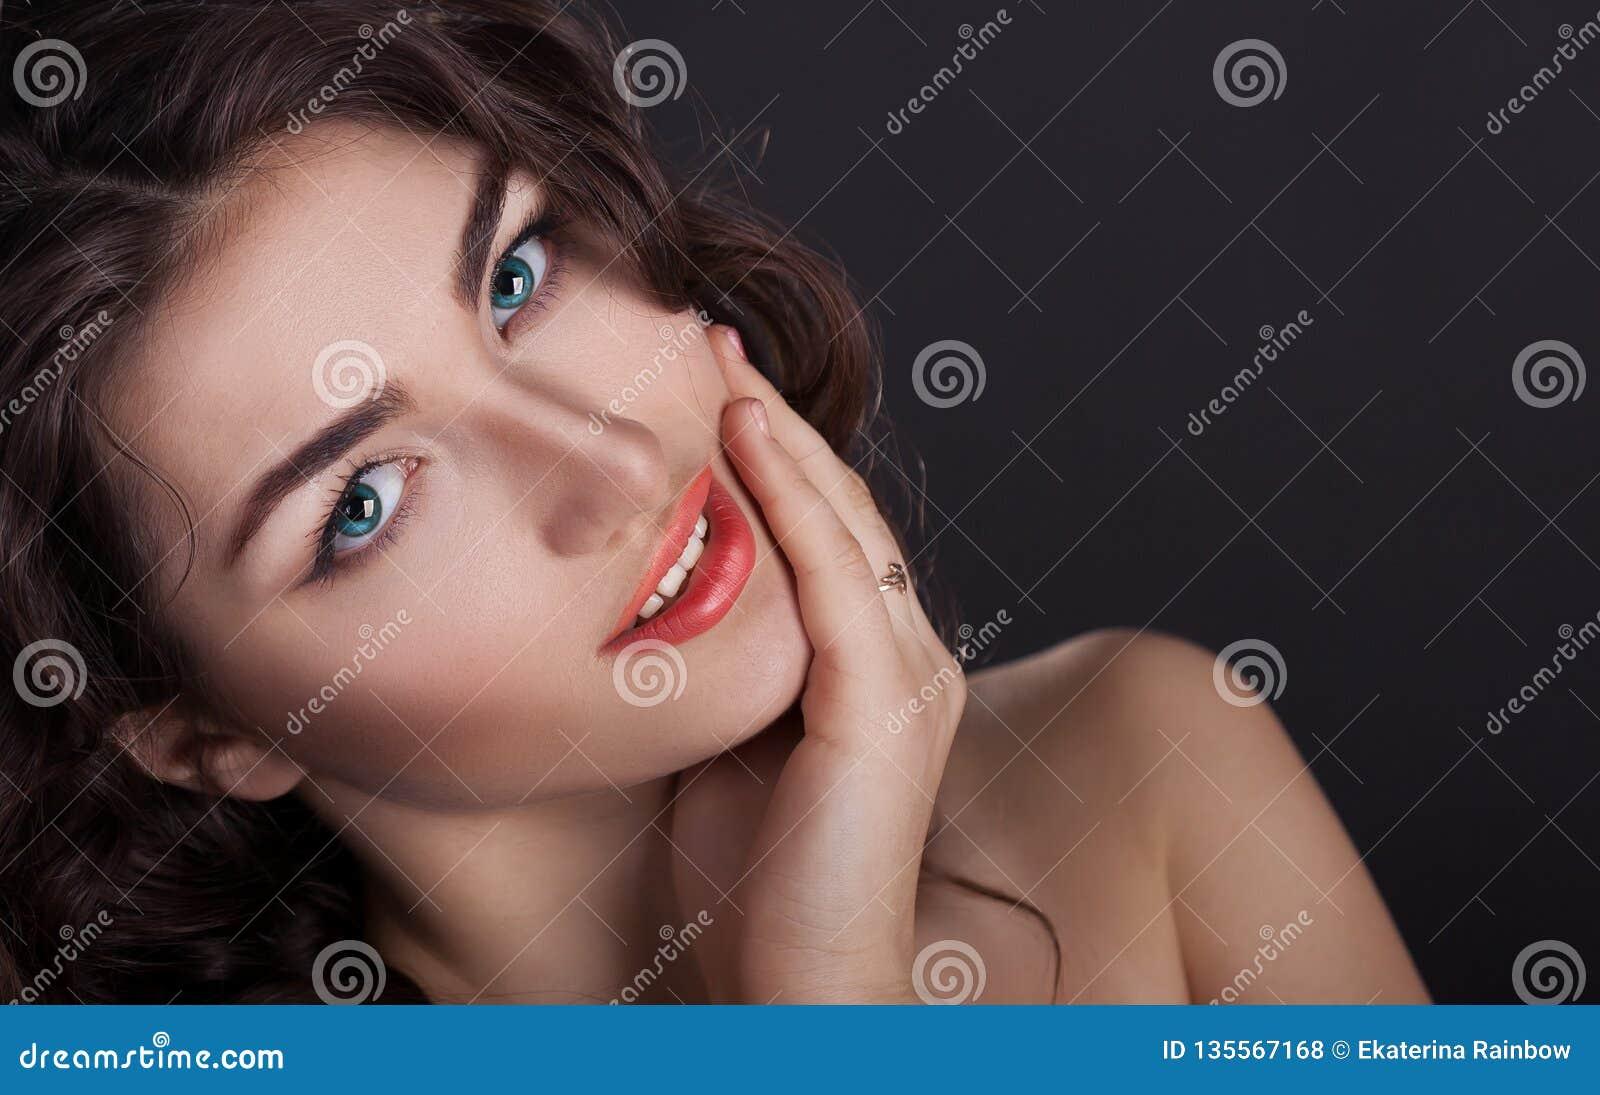 Cara, lentes de contato azuis, fundo preto, divertimento